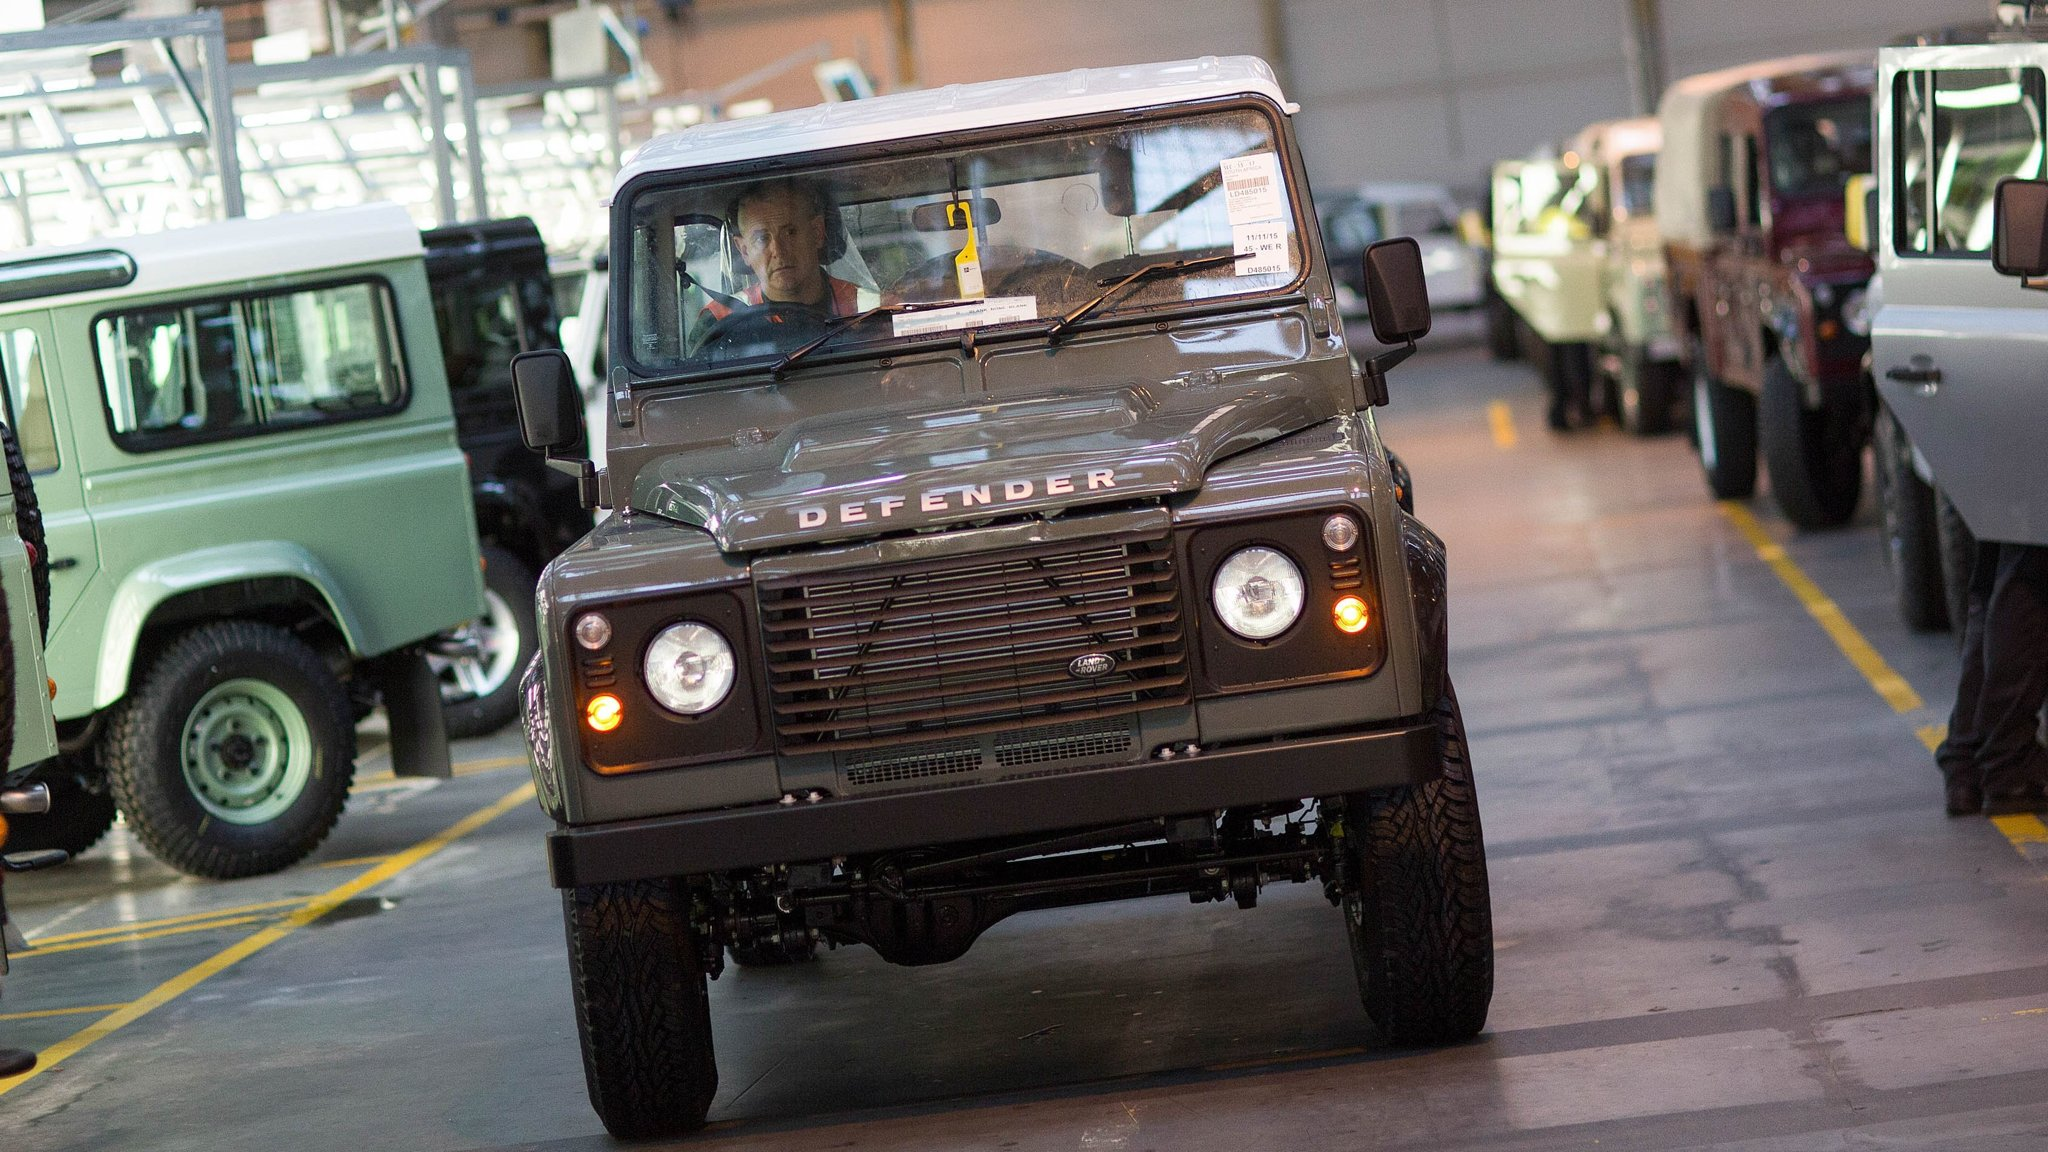 Return Of Jaguars Land Rover Defender Relished By Off Road Fans Financial Times